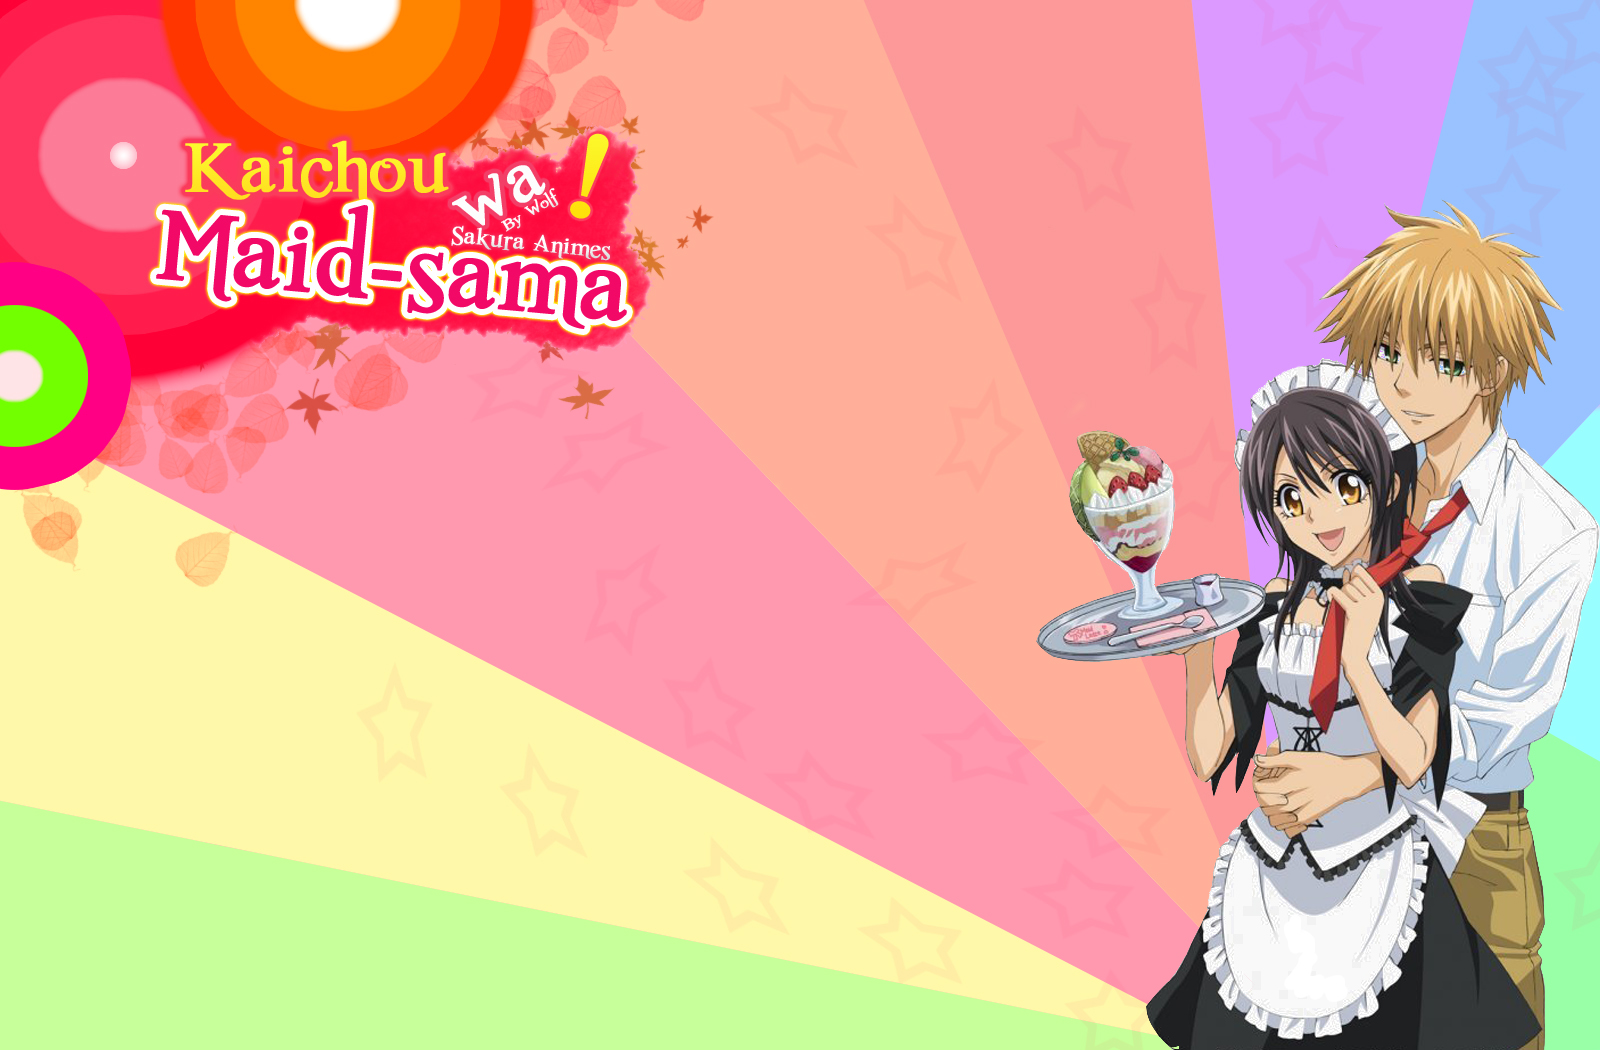 http://1.bp.blogspot.com/-meGKSd8hE-k/TZeDx2lkNCI/AAAAAAAAIYE/7nfnxRITkIg/s1600/kaichou_sakura.jpg